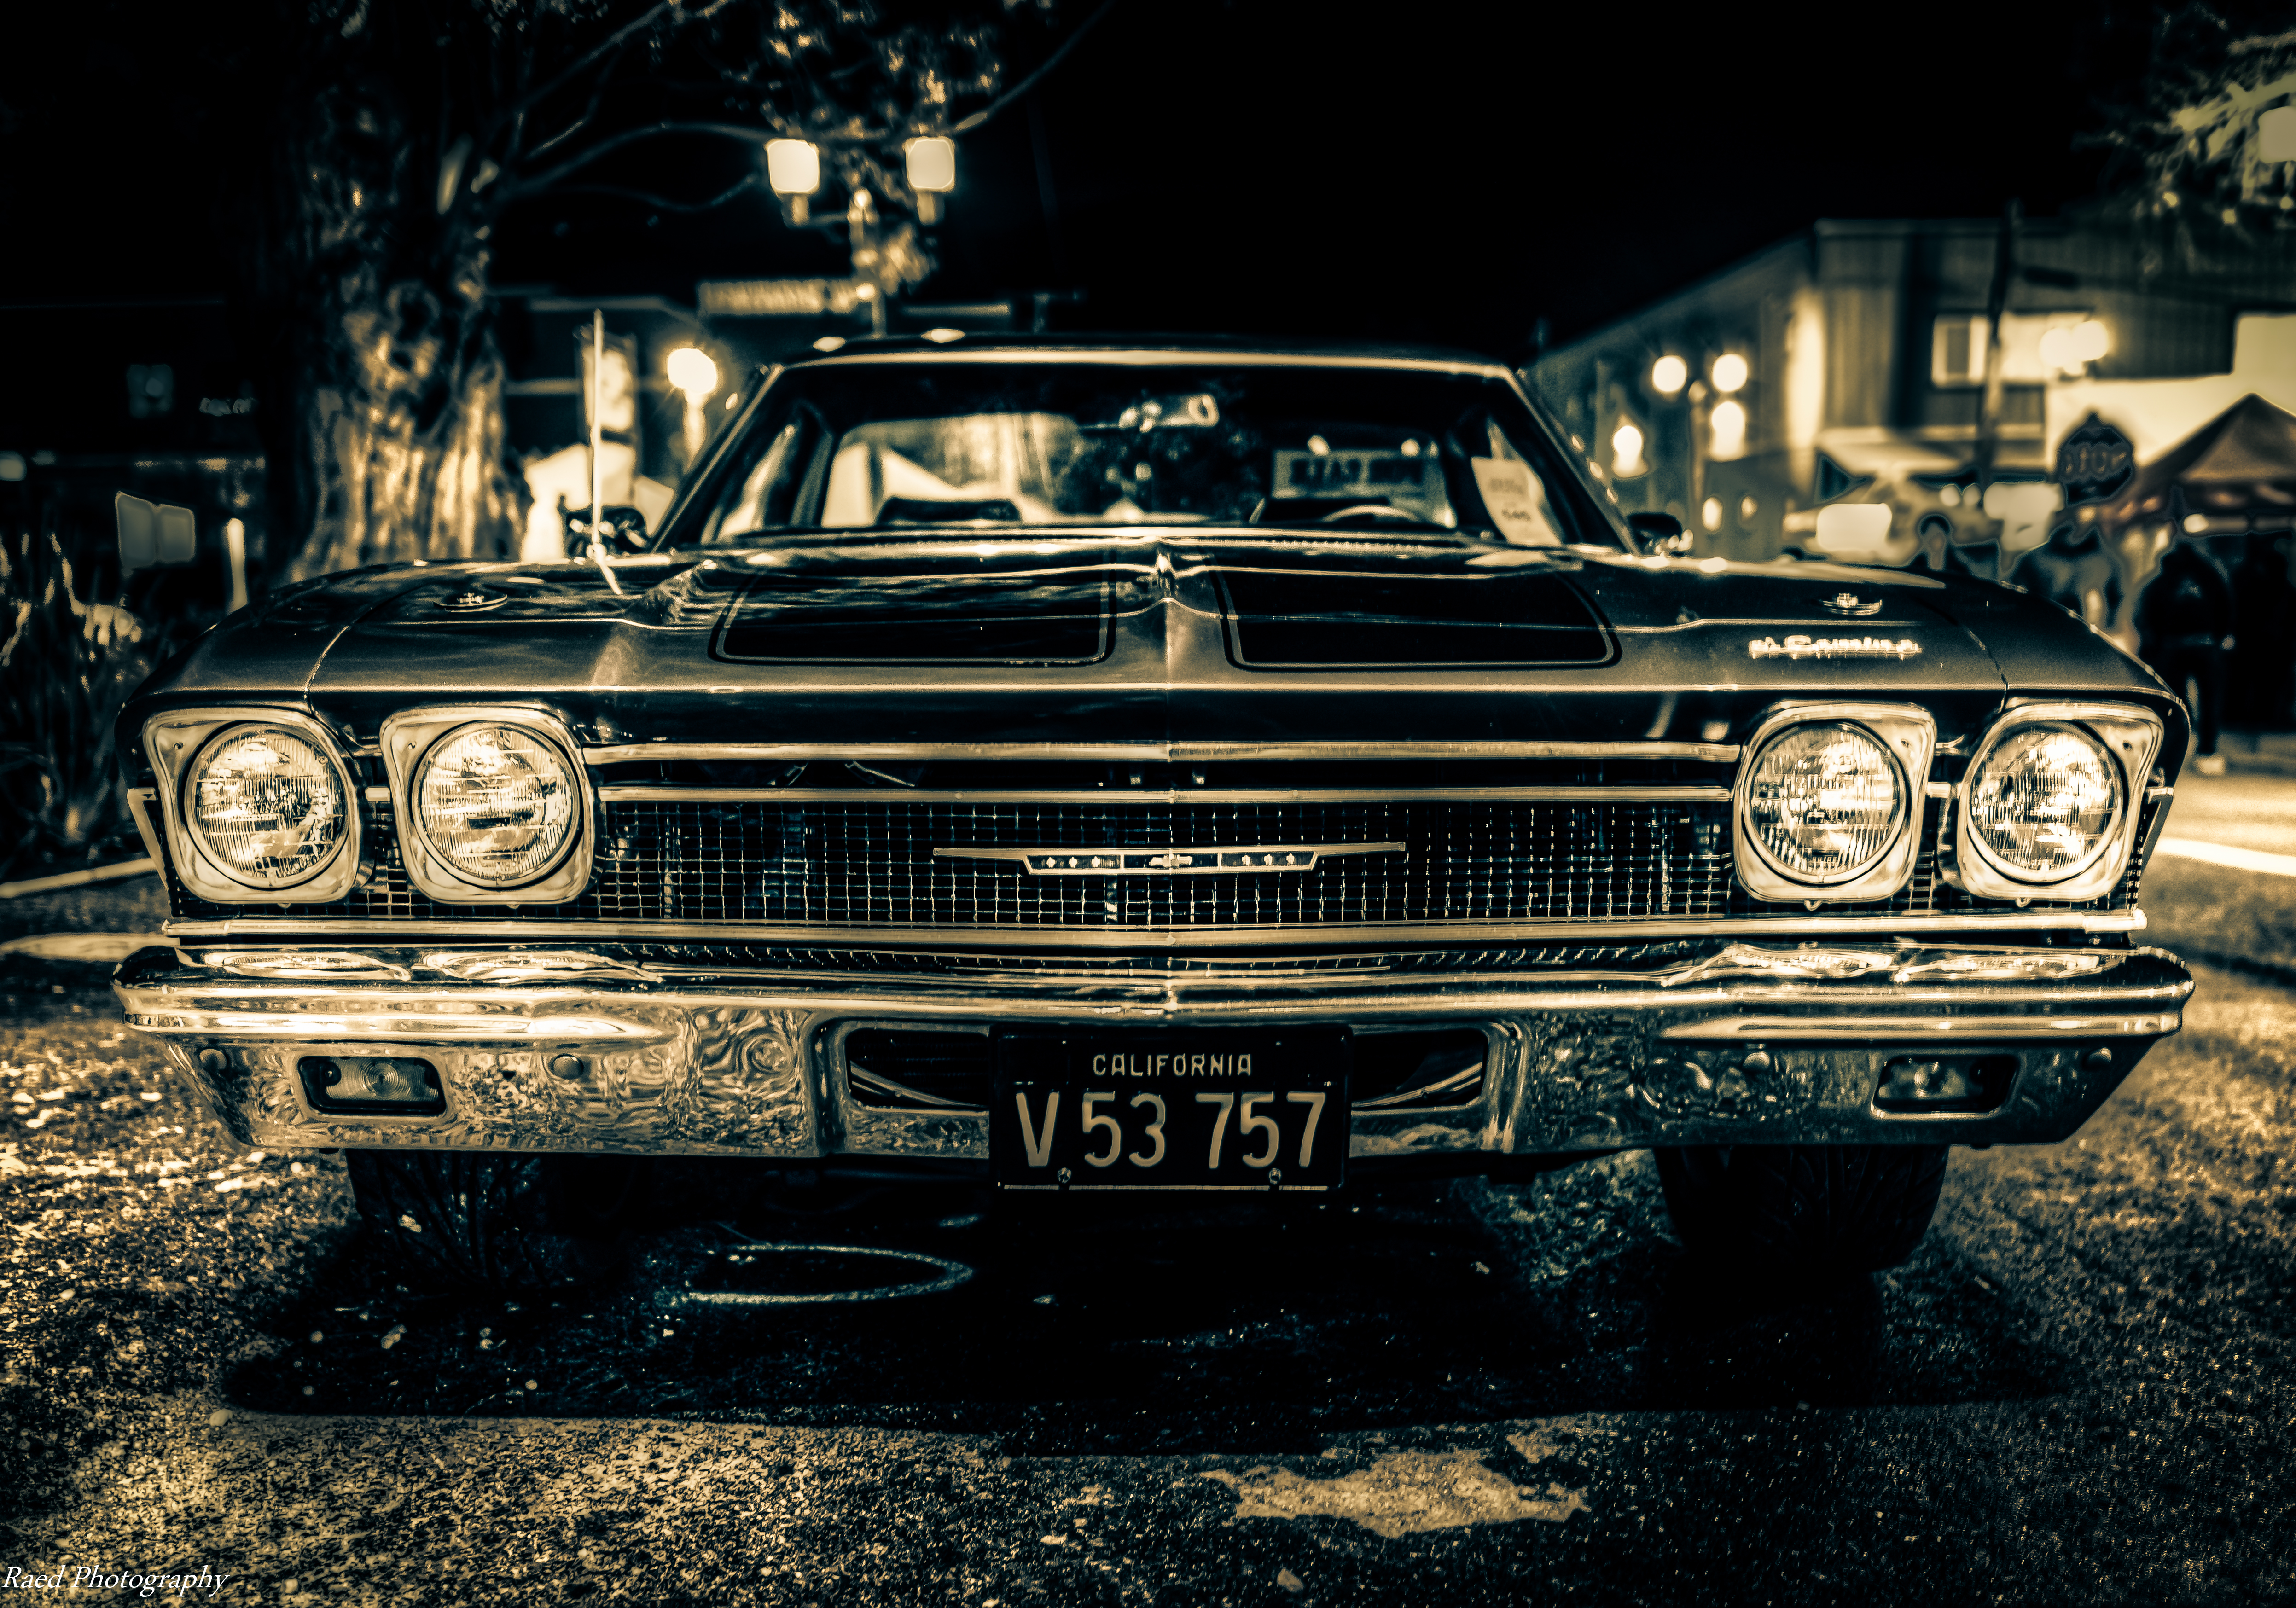 vintage cars | My Camera Journal